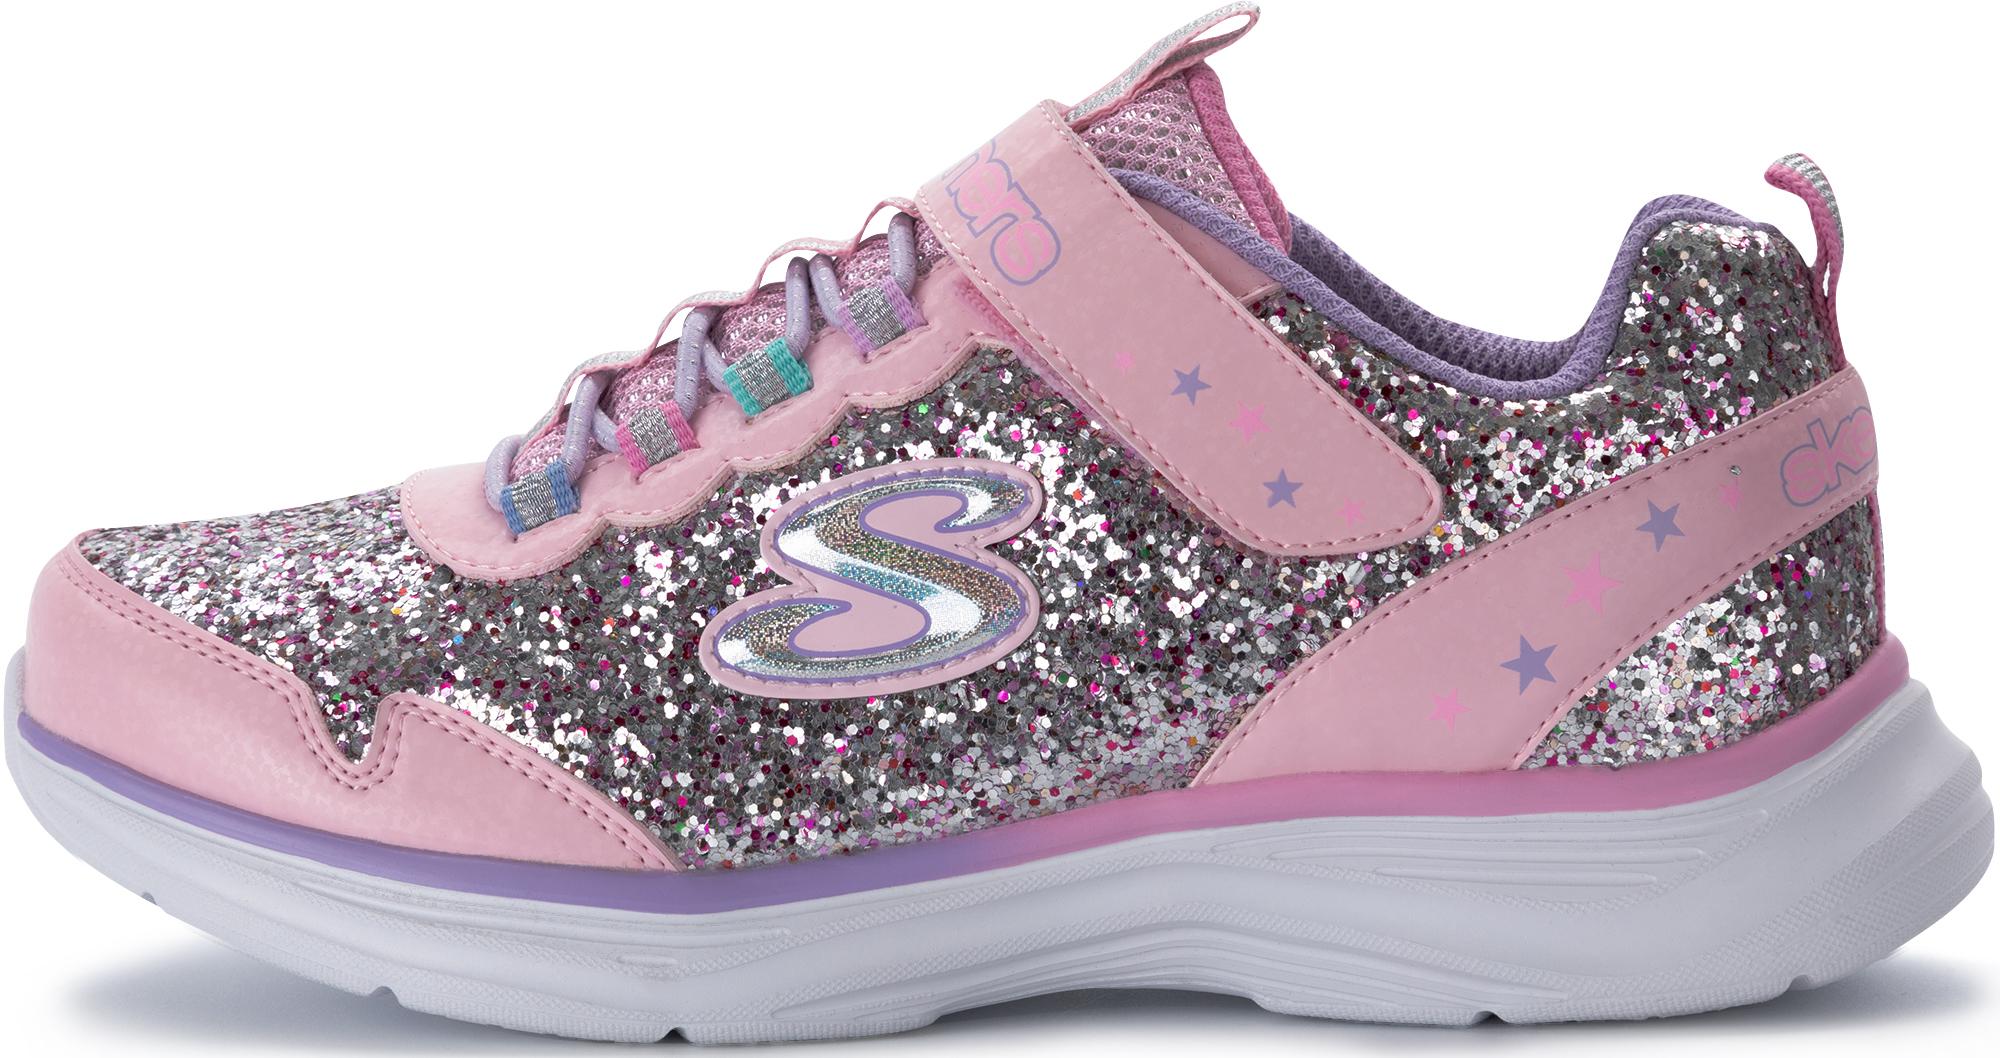 Skechers Кроссовки для девочек Skechers Glimmer Kicks, размер 30 все цены